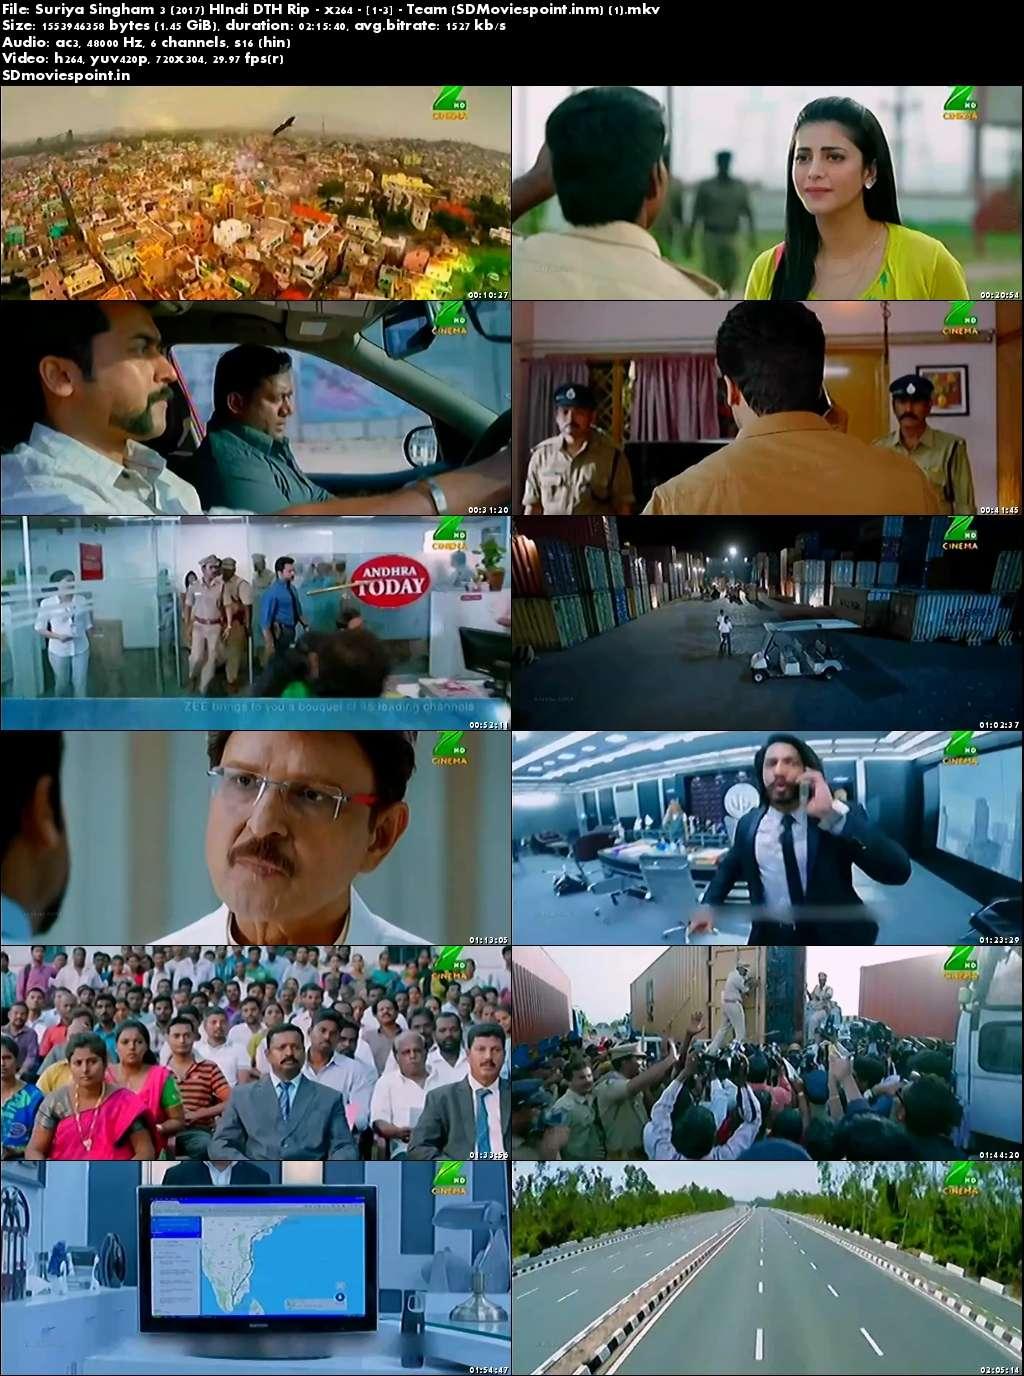 Screen Shots Singam 3 (2017) Full Hindi Dubbed Movie Download HD 720p